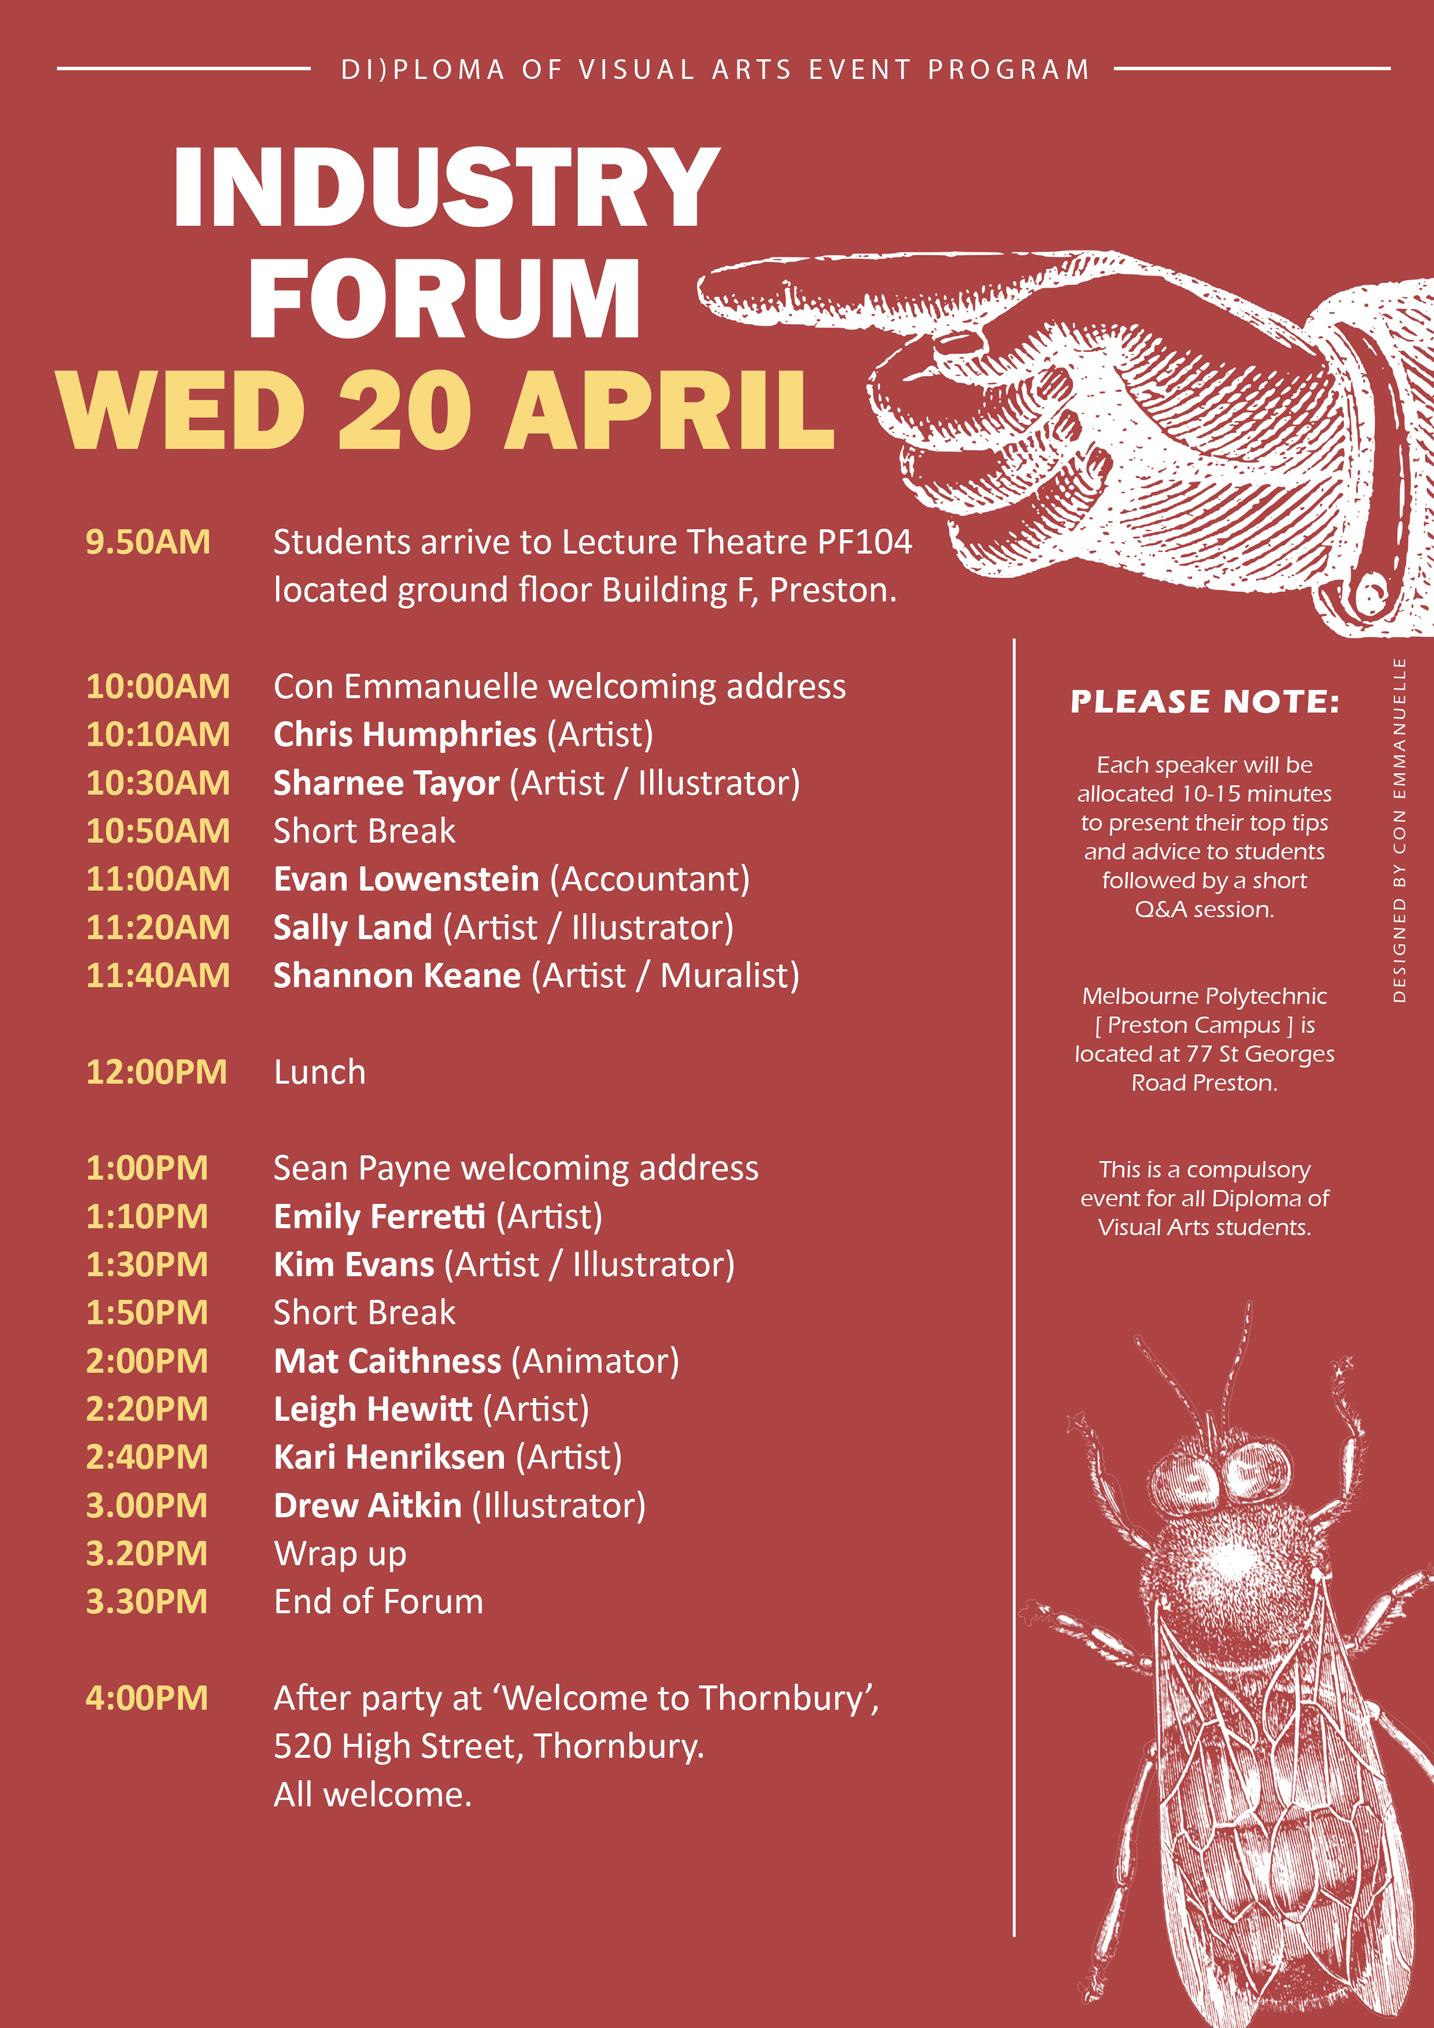 Industry-Forum-programme-20-April-2016